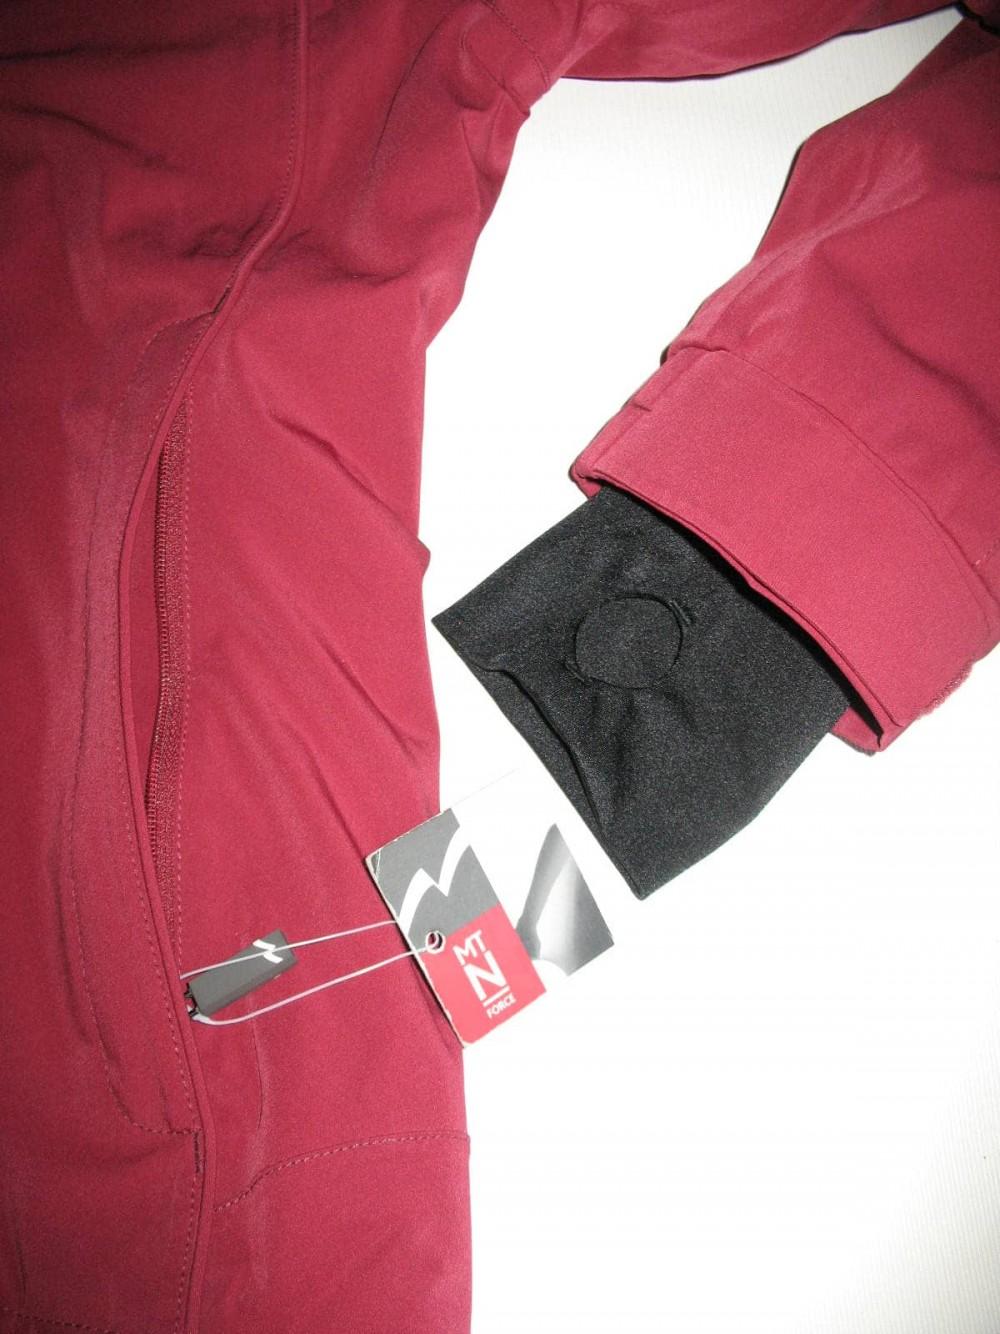 Куртка MOUNTAIN FORCE outdoor jacket lady (размер 36/S) - 4